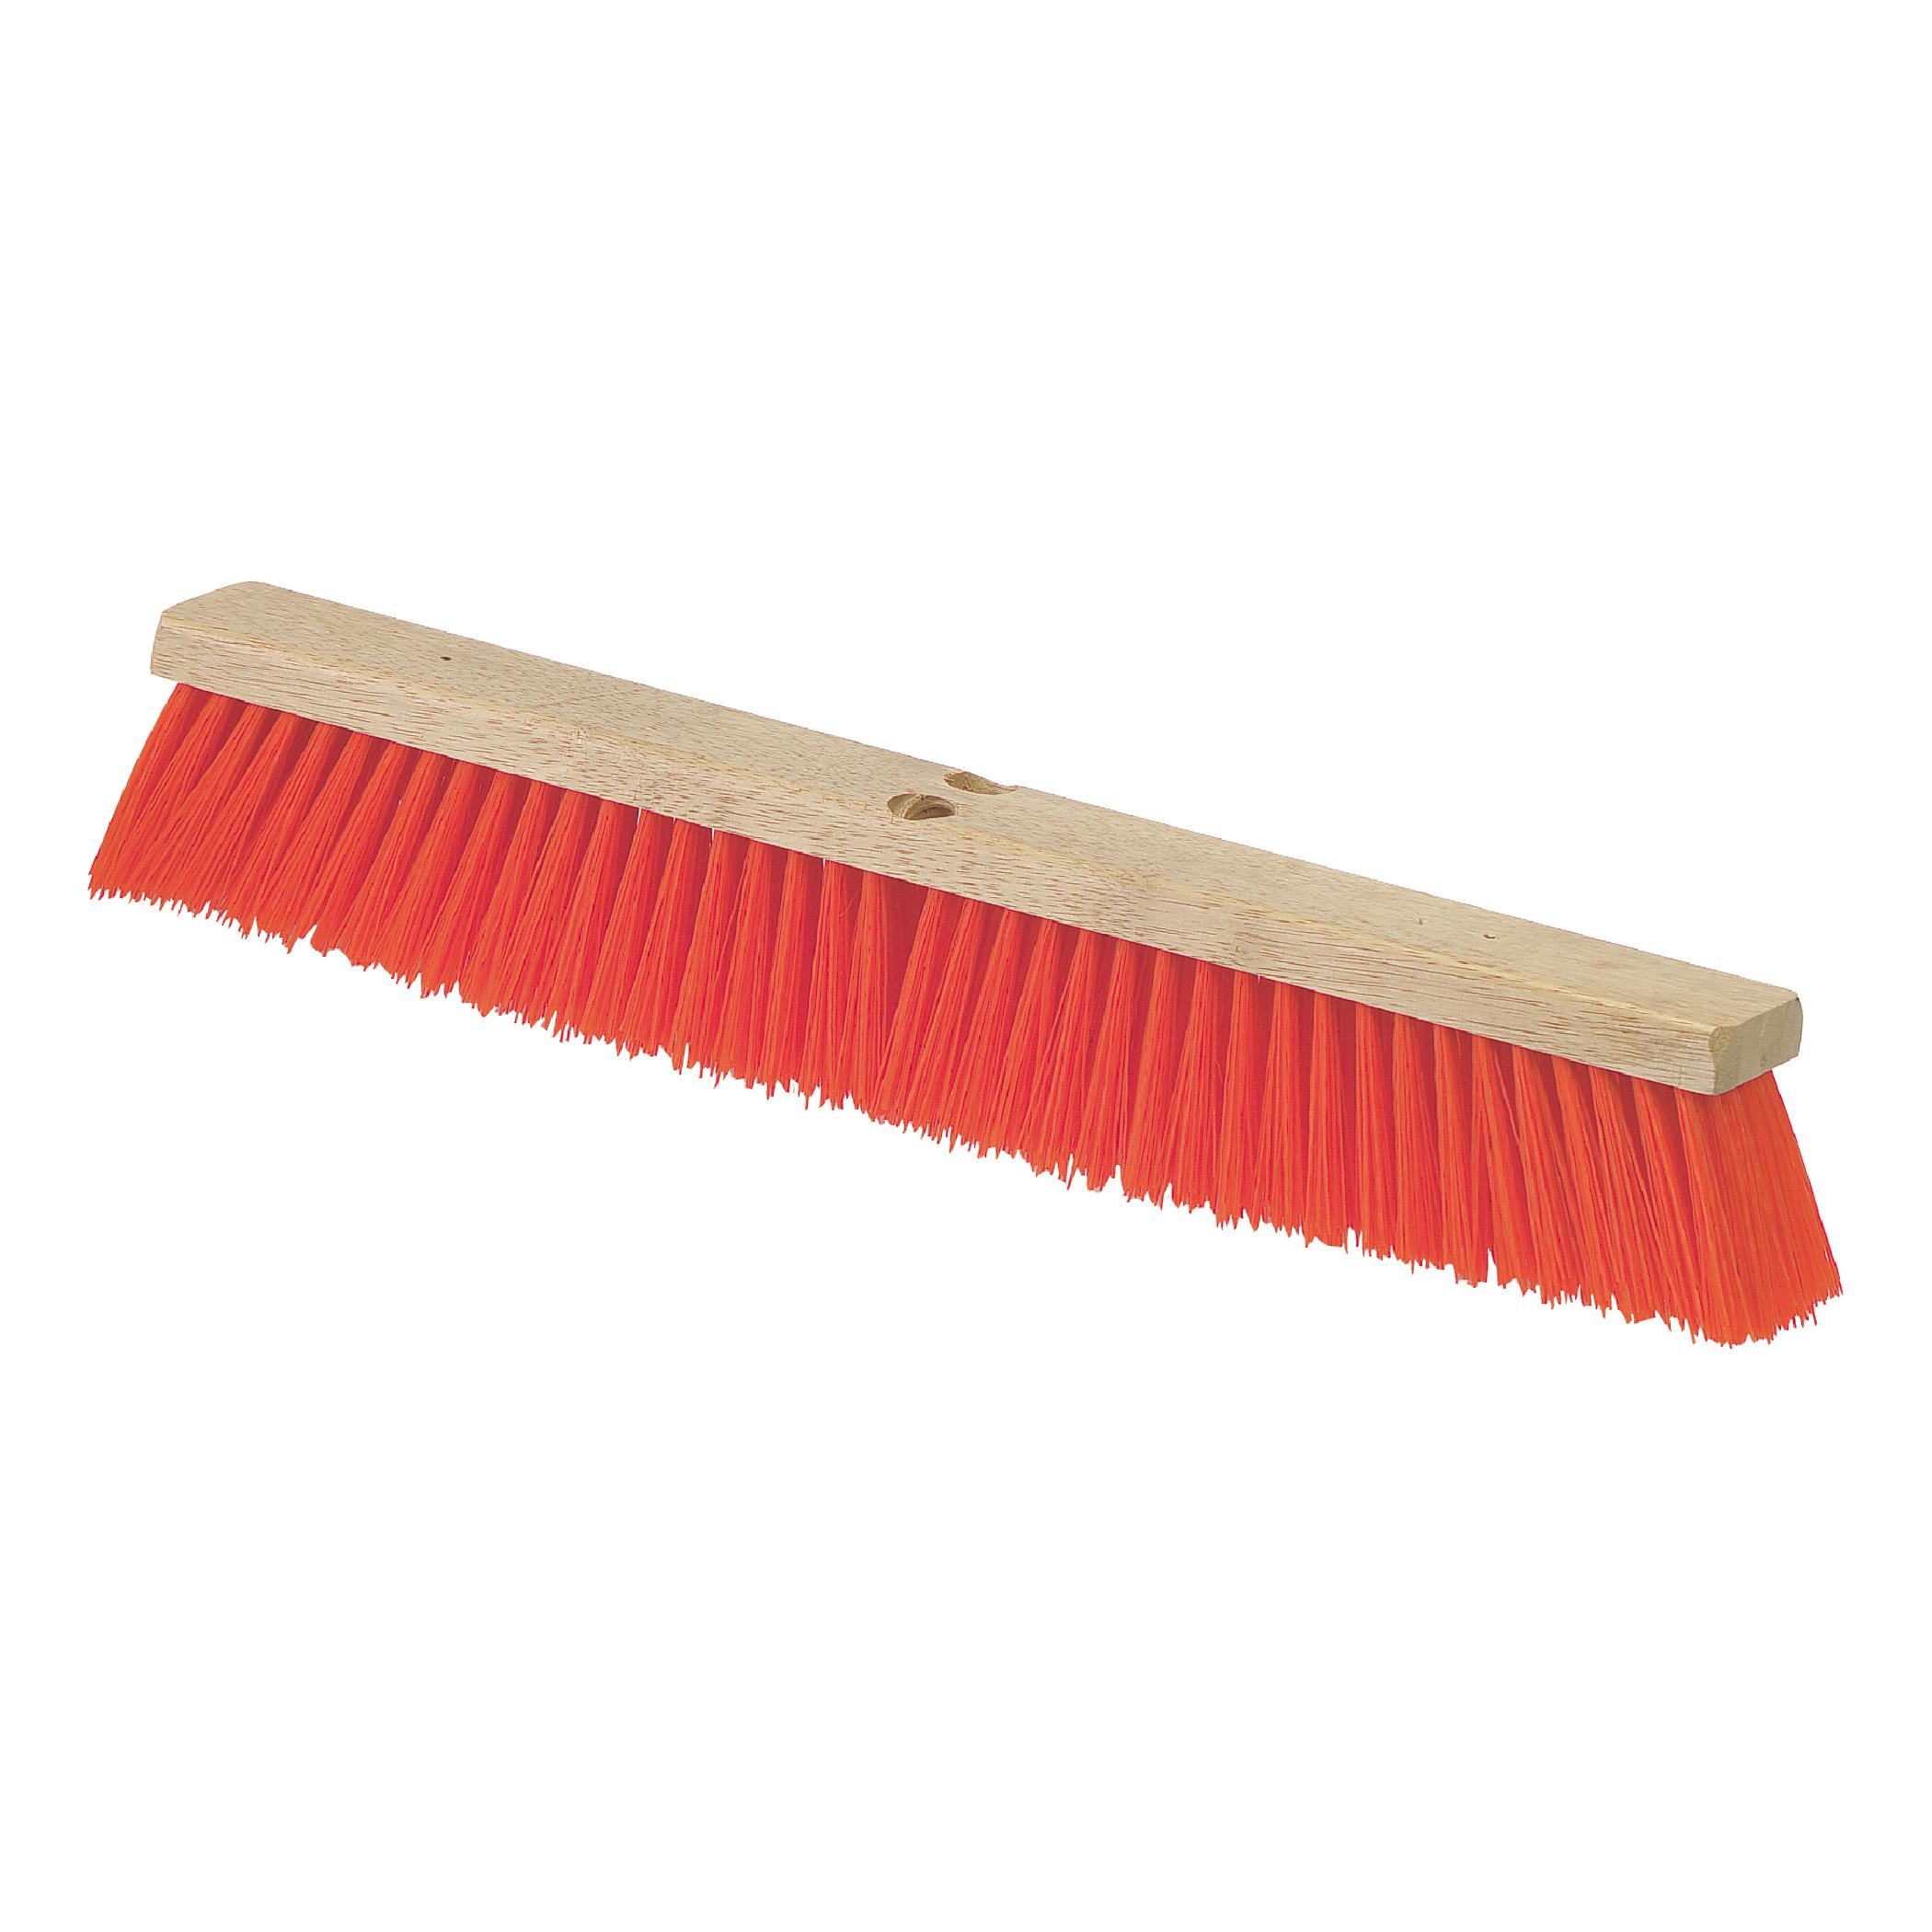 Carlisle 36762424 broom head, push